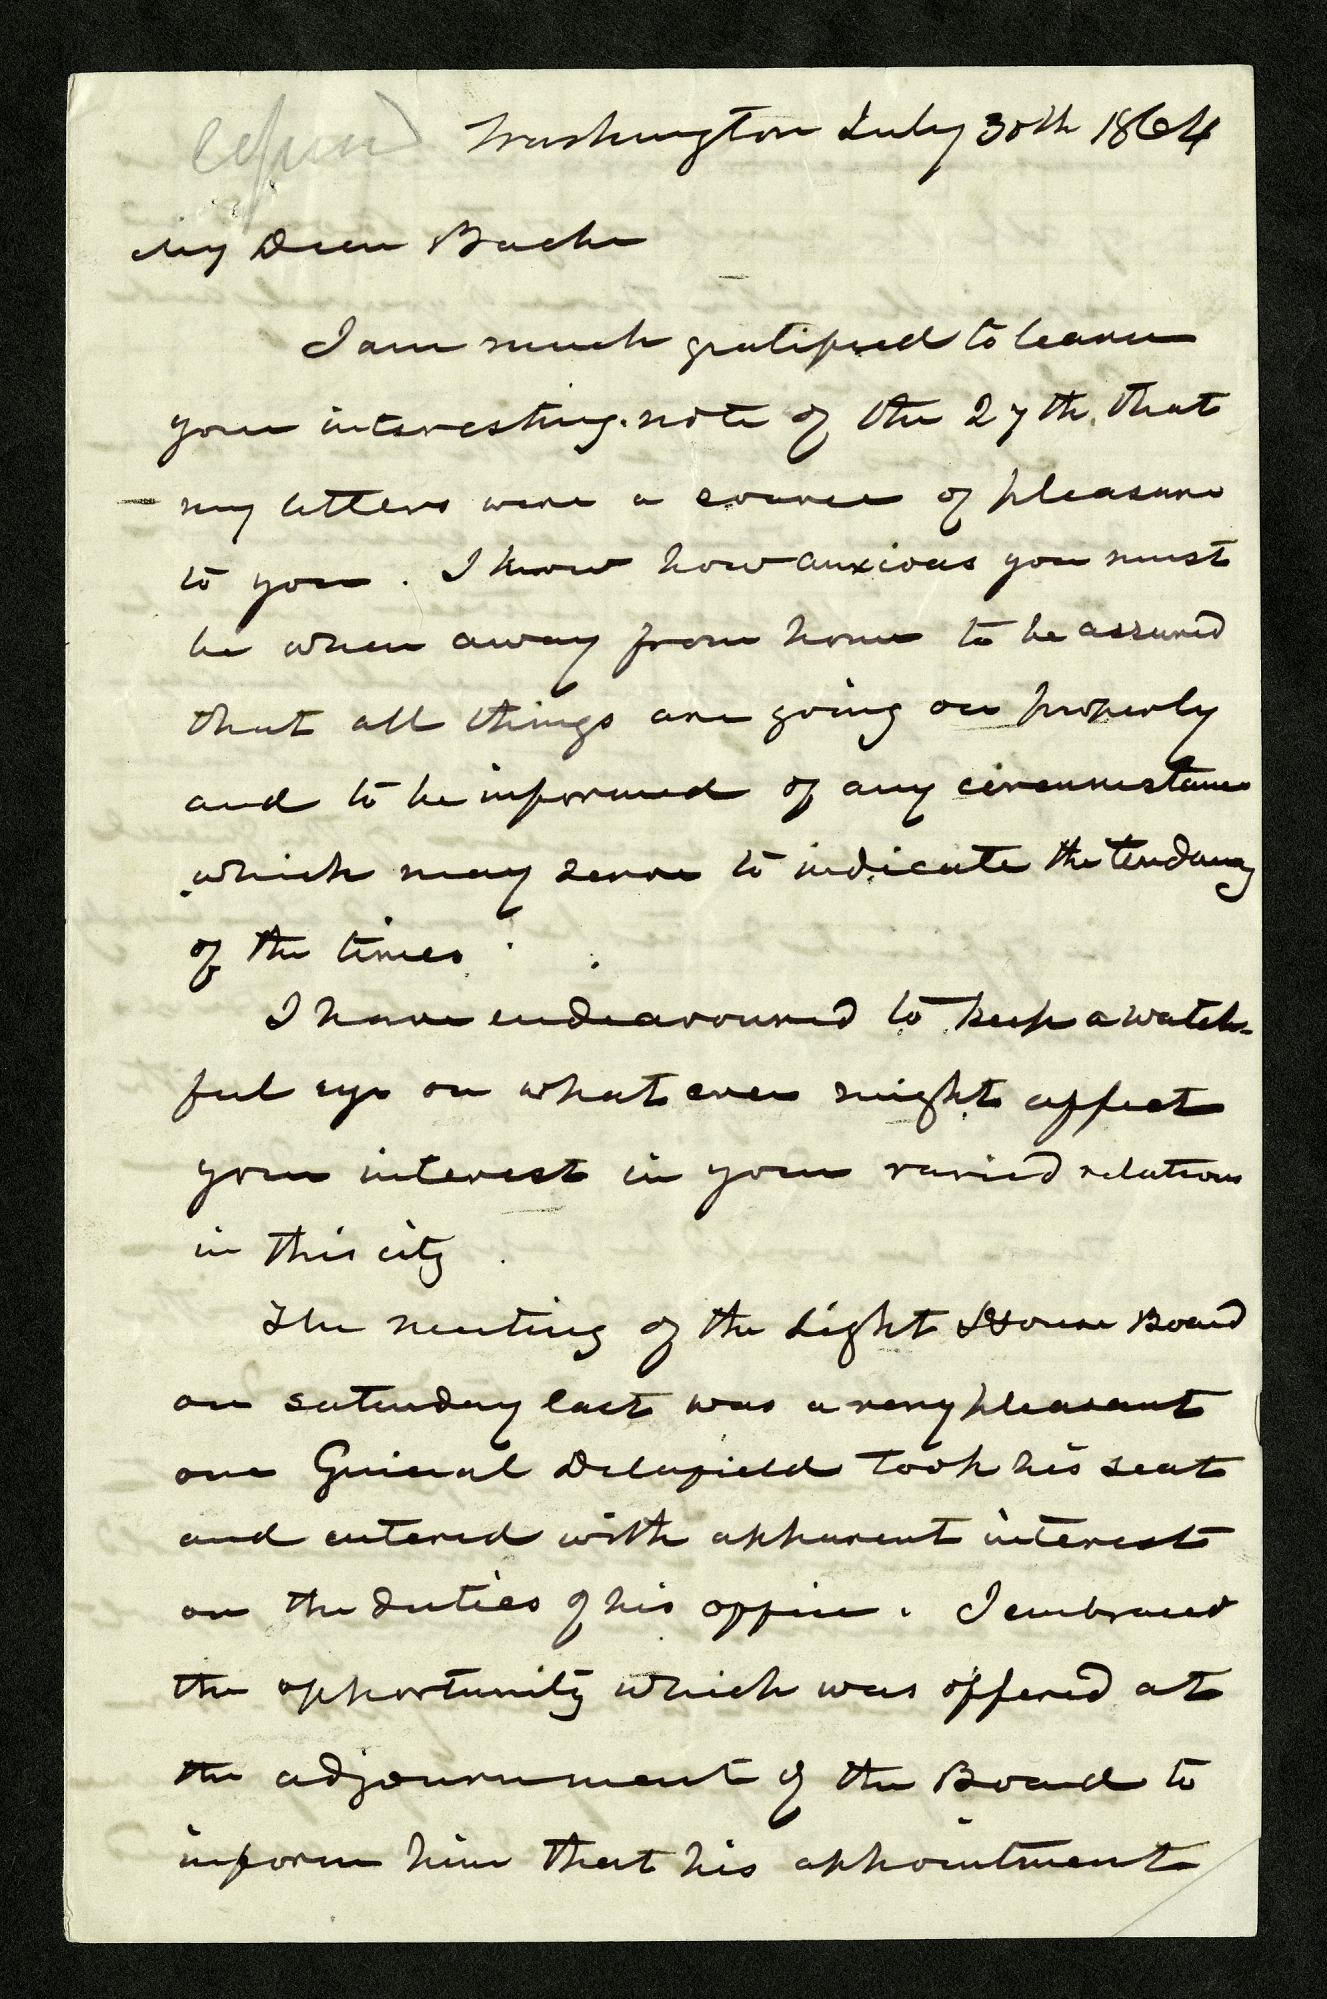 Joseph Henry's Letter to Alexander Bache (July 30, 1864)